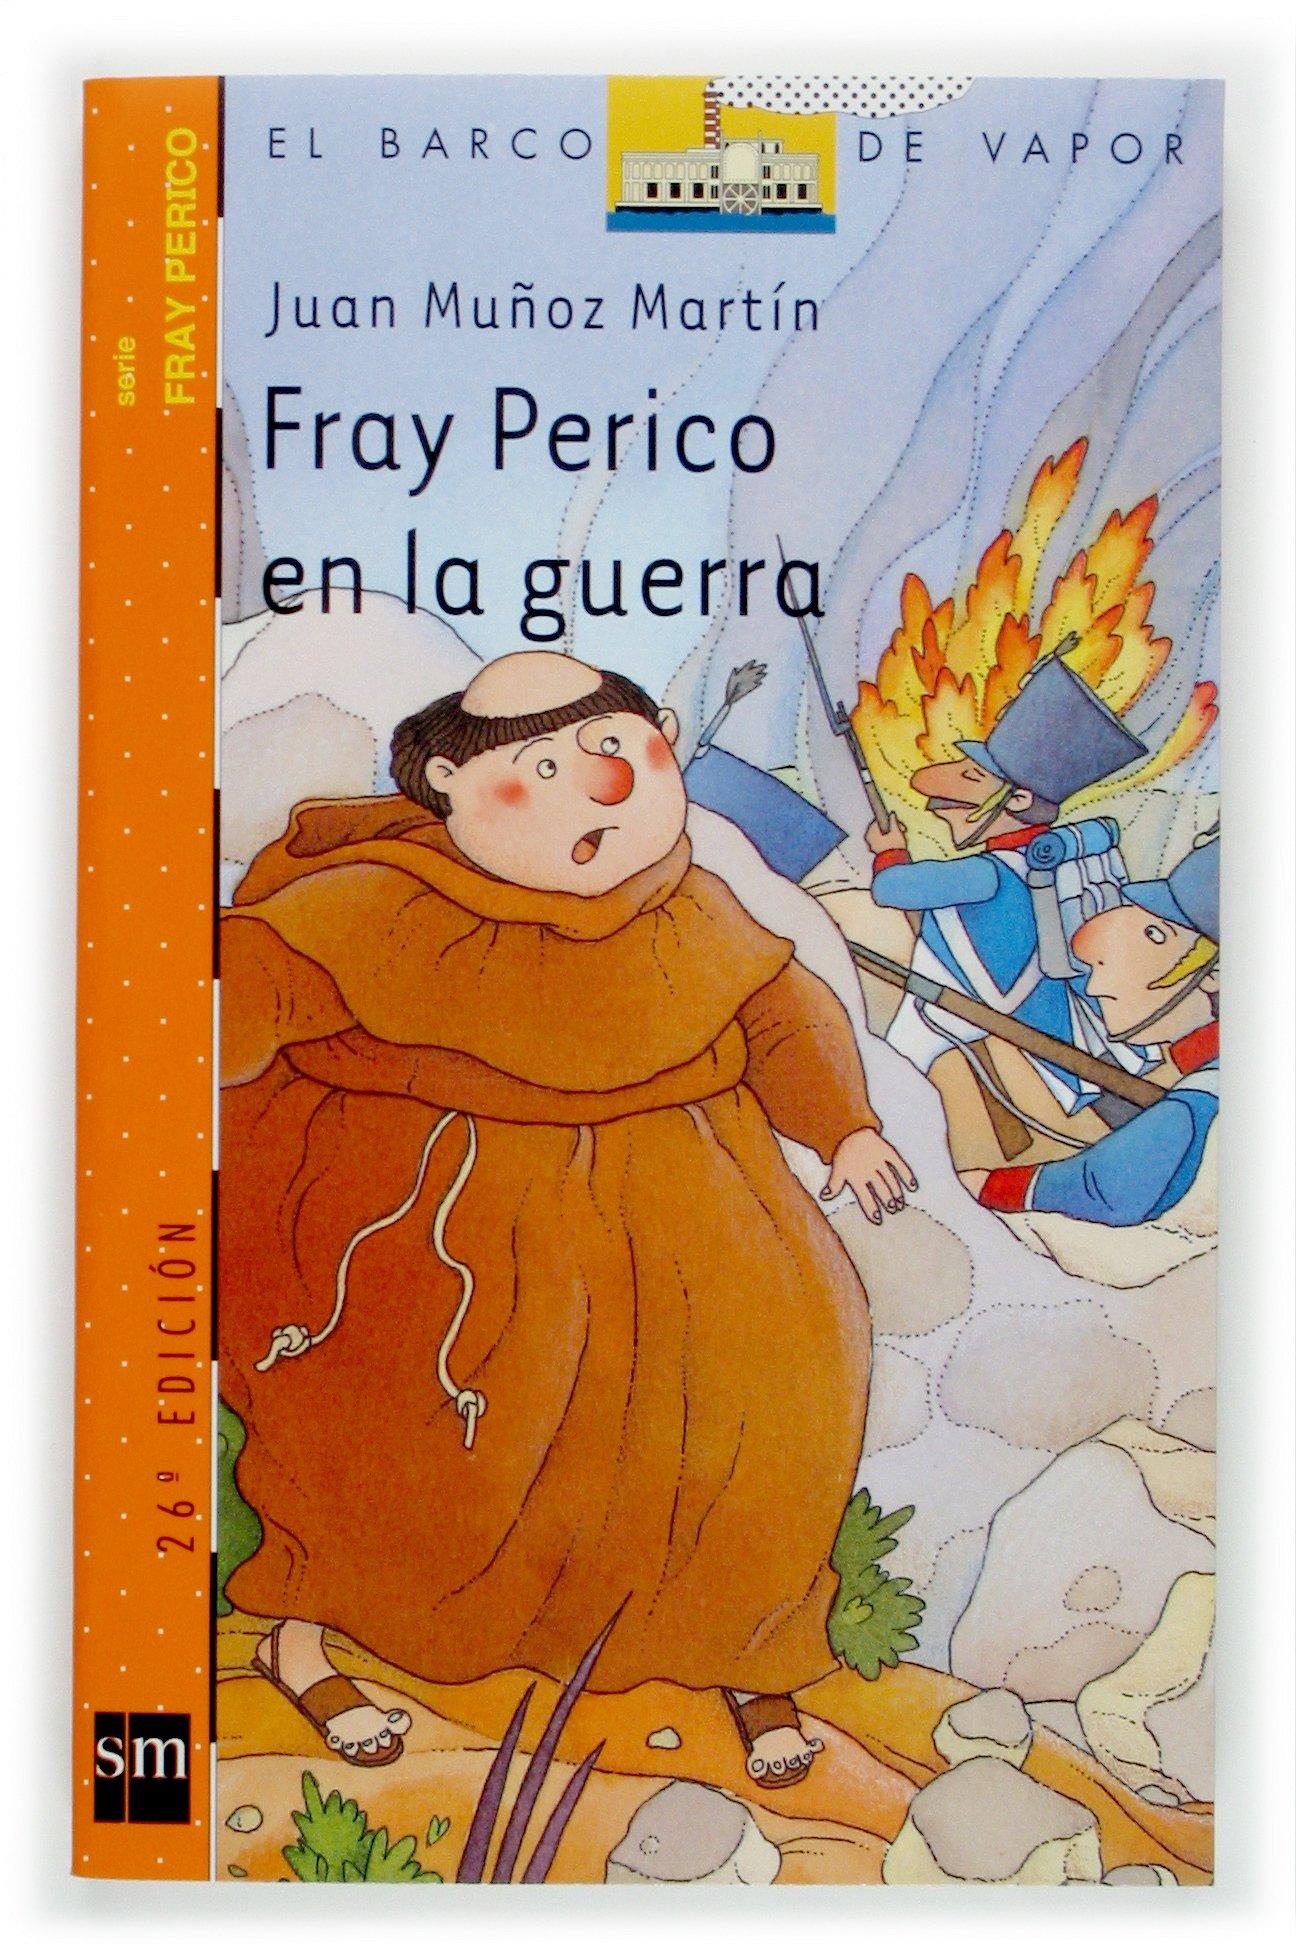 Fray Perico En La Guerra Barco De Vapor Naranja Muñoz Martín Juan Tello Gil Antonio 9788434894105 Books